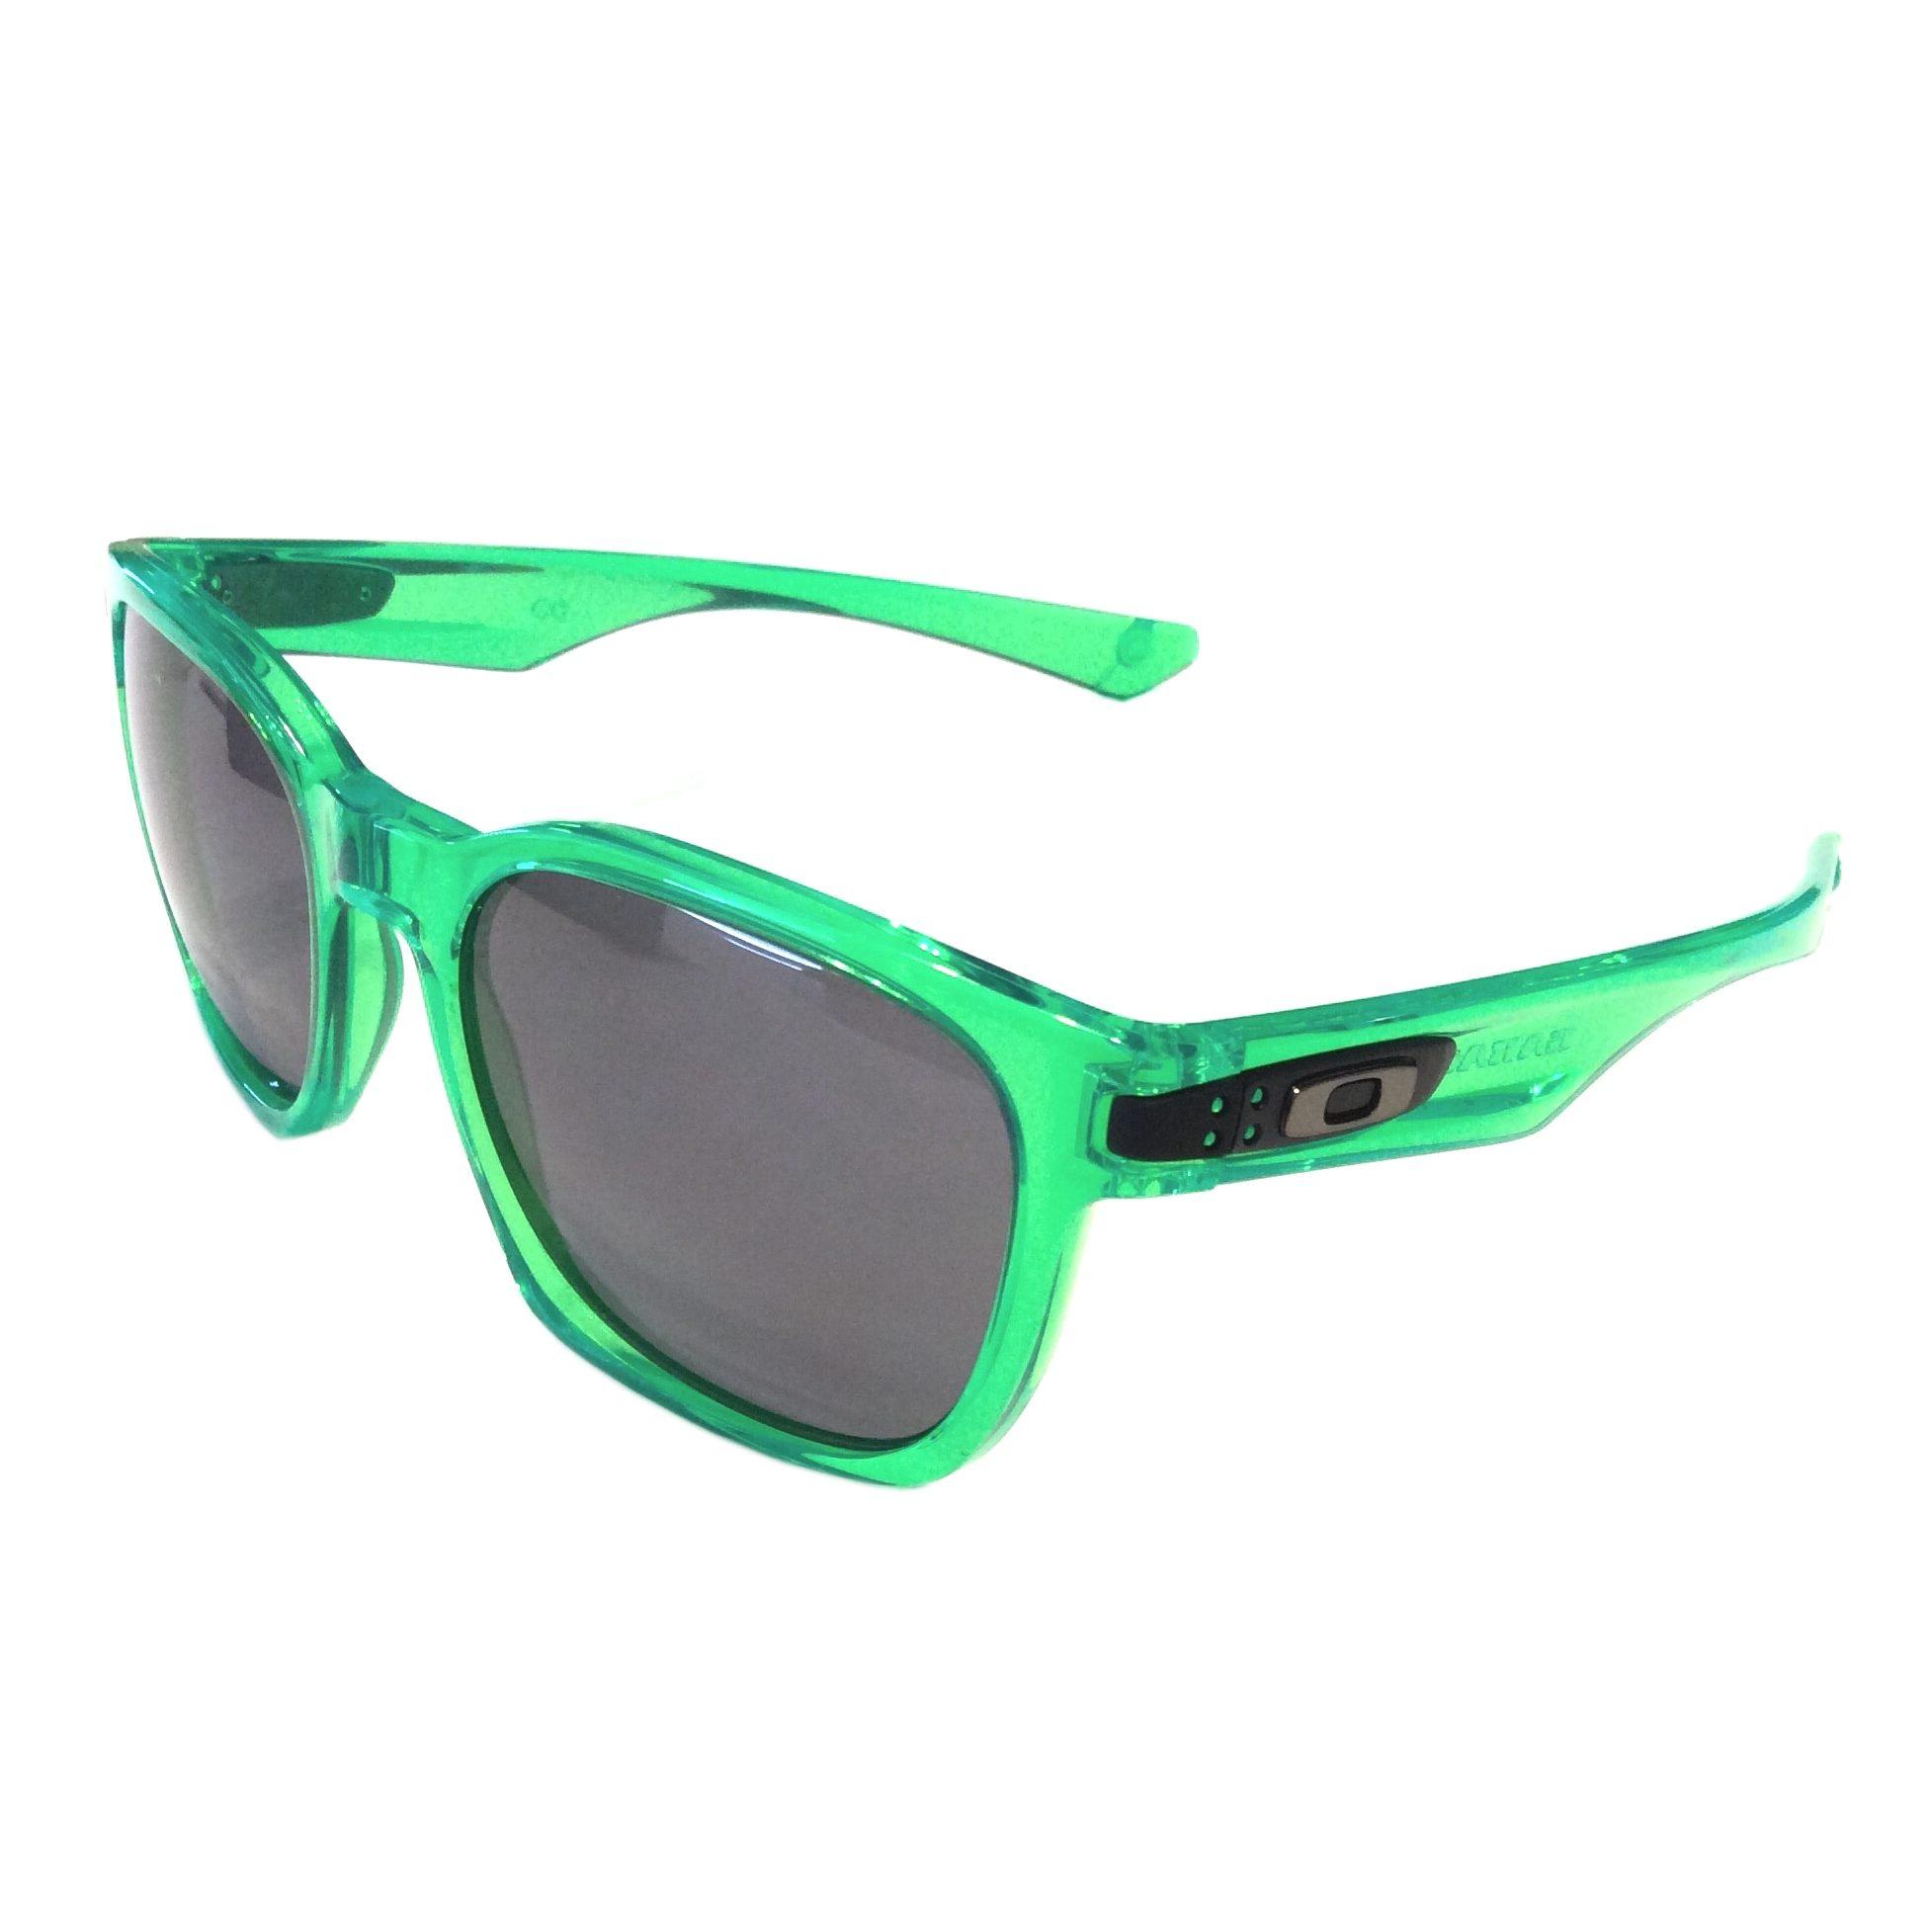 c8539a635c6 Oakley Garage Rock MPH Sunglasses – Anti Freeze Green Frame – Gray Lens –  OO9175-38